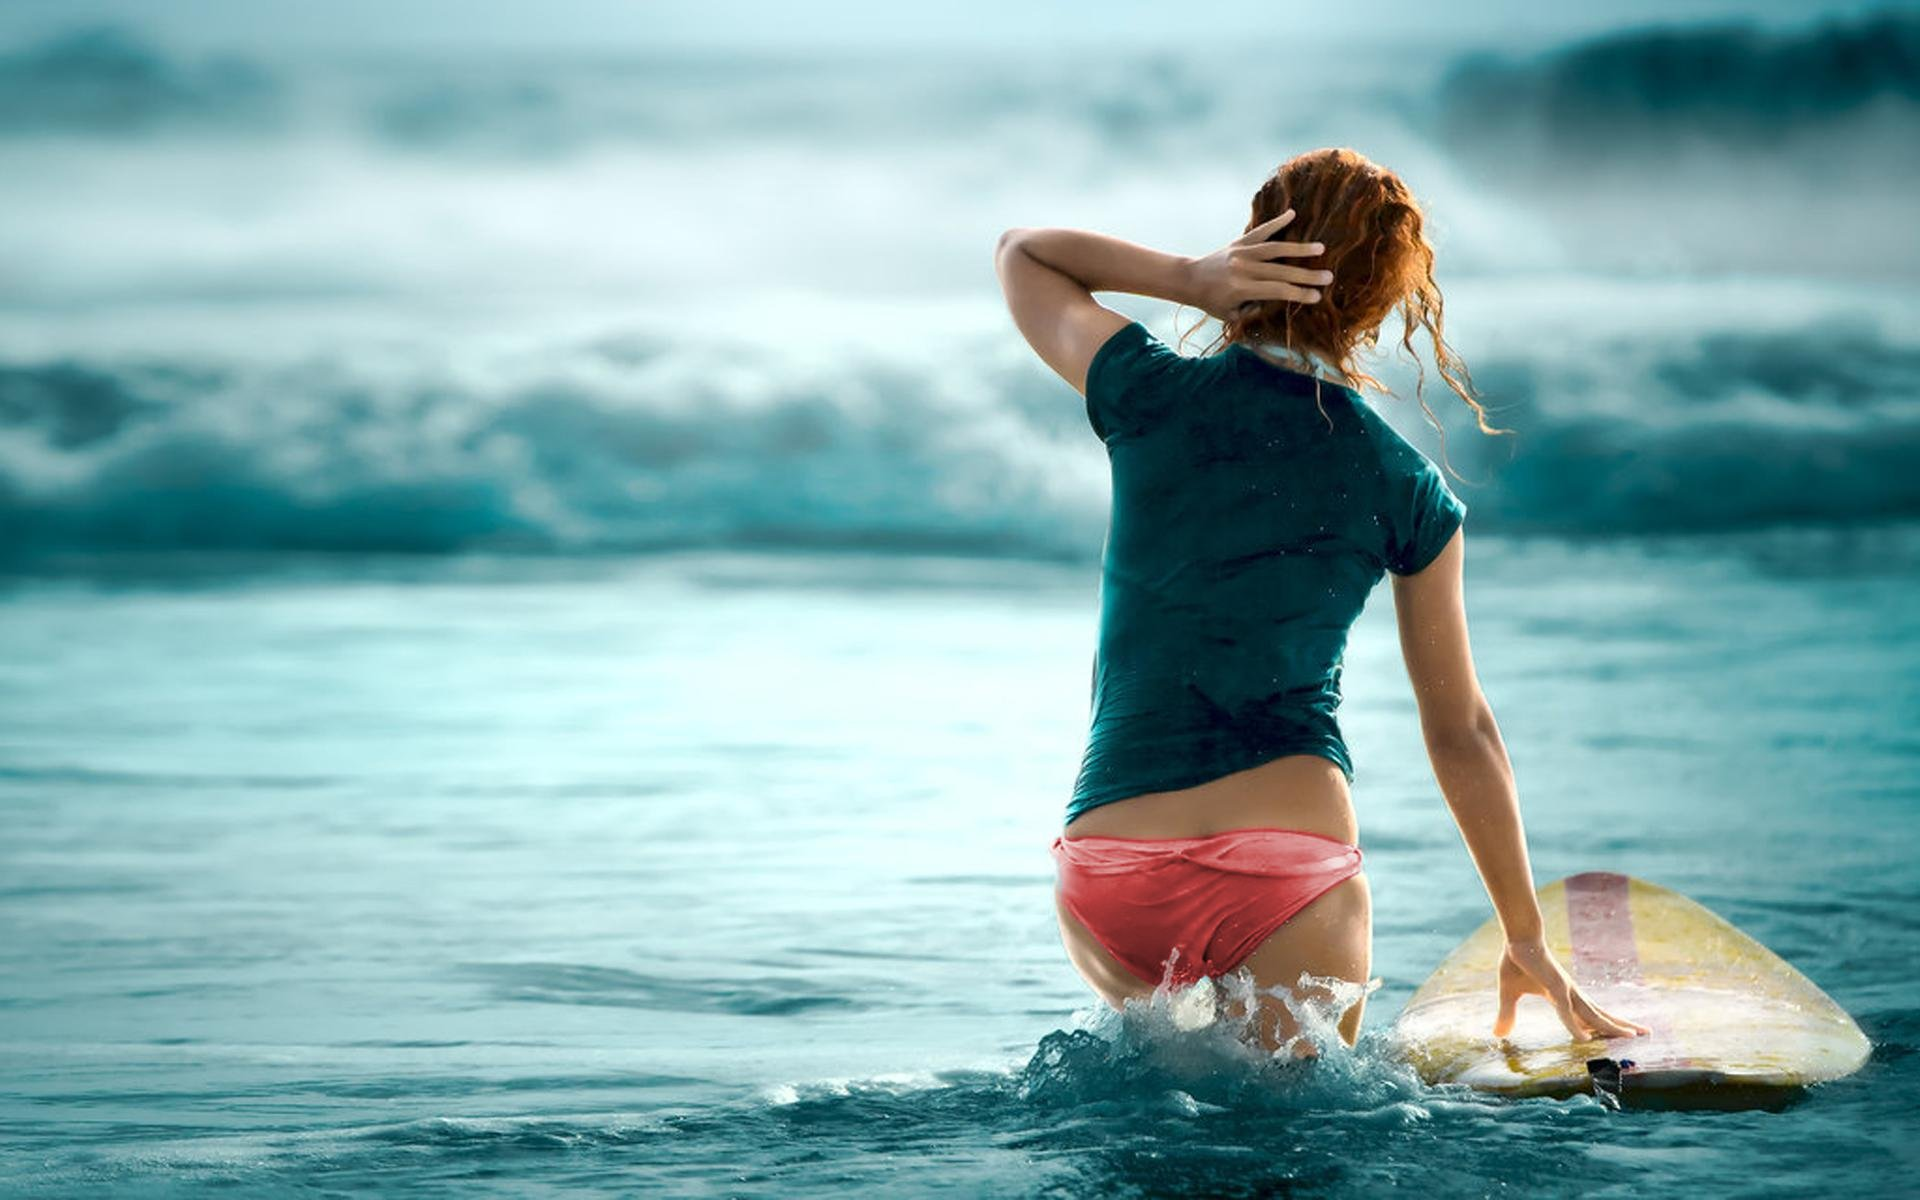 chick surfer girl wallpaper | beach